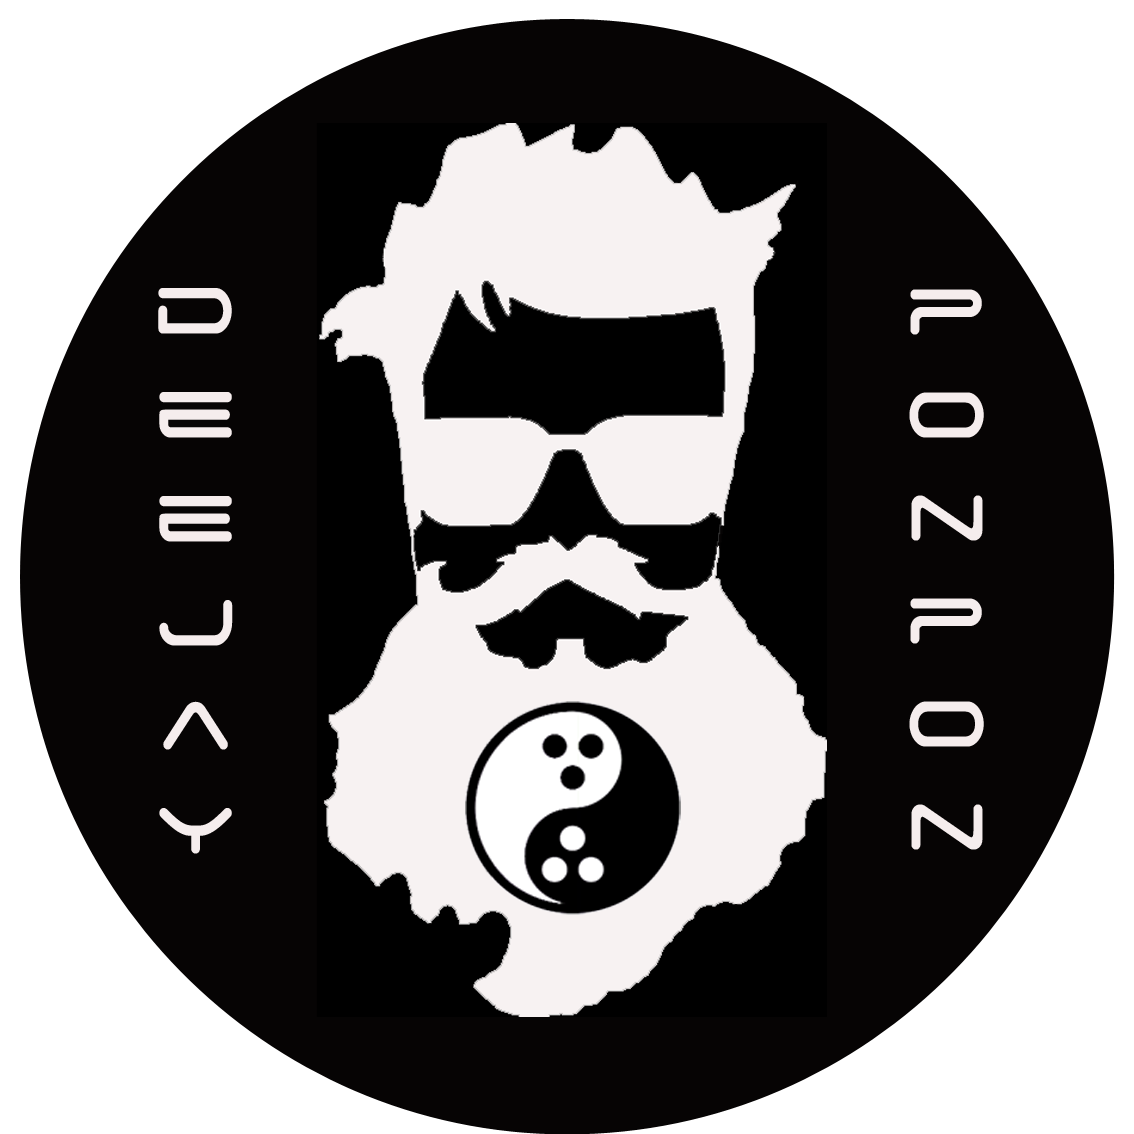 DeeJay PonPon